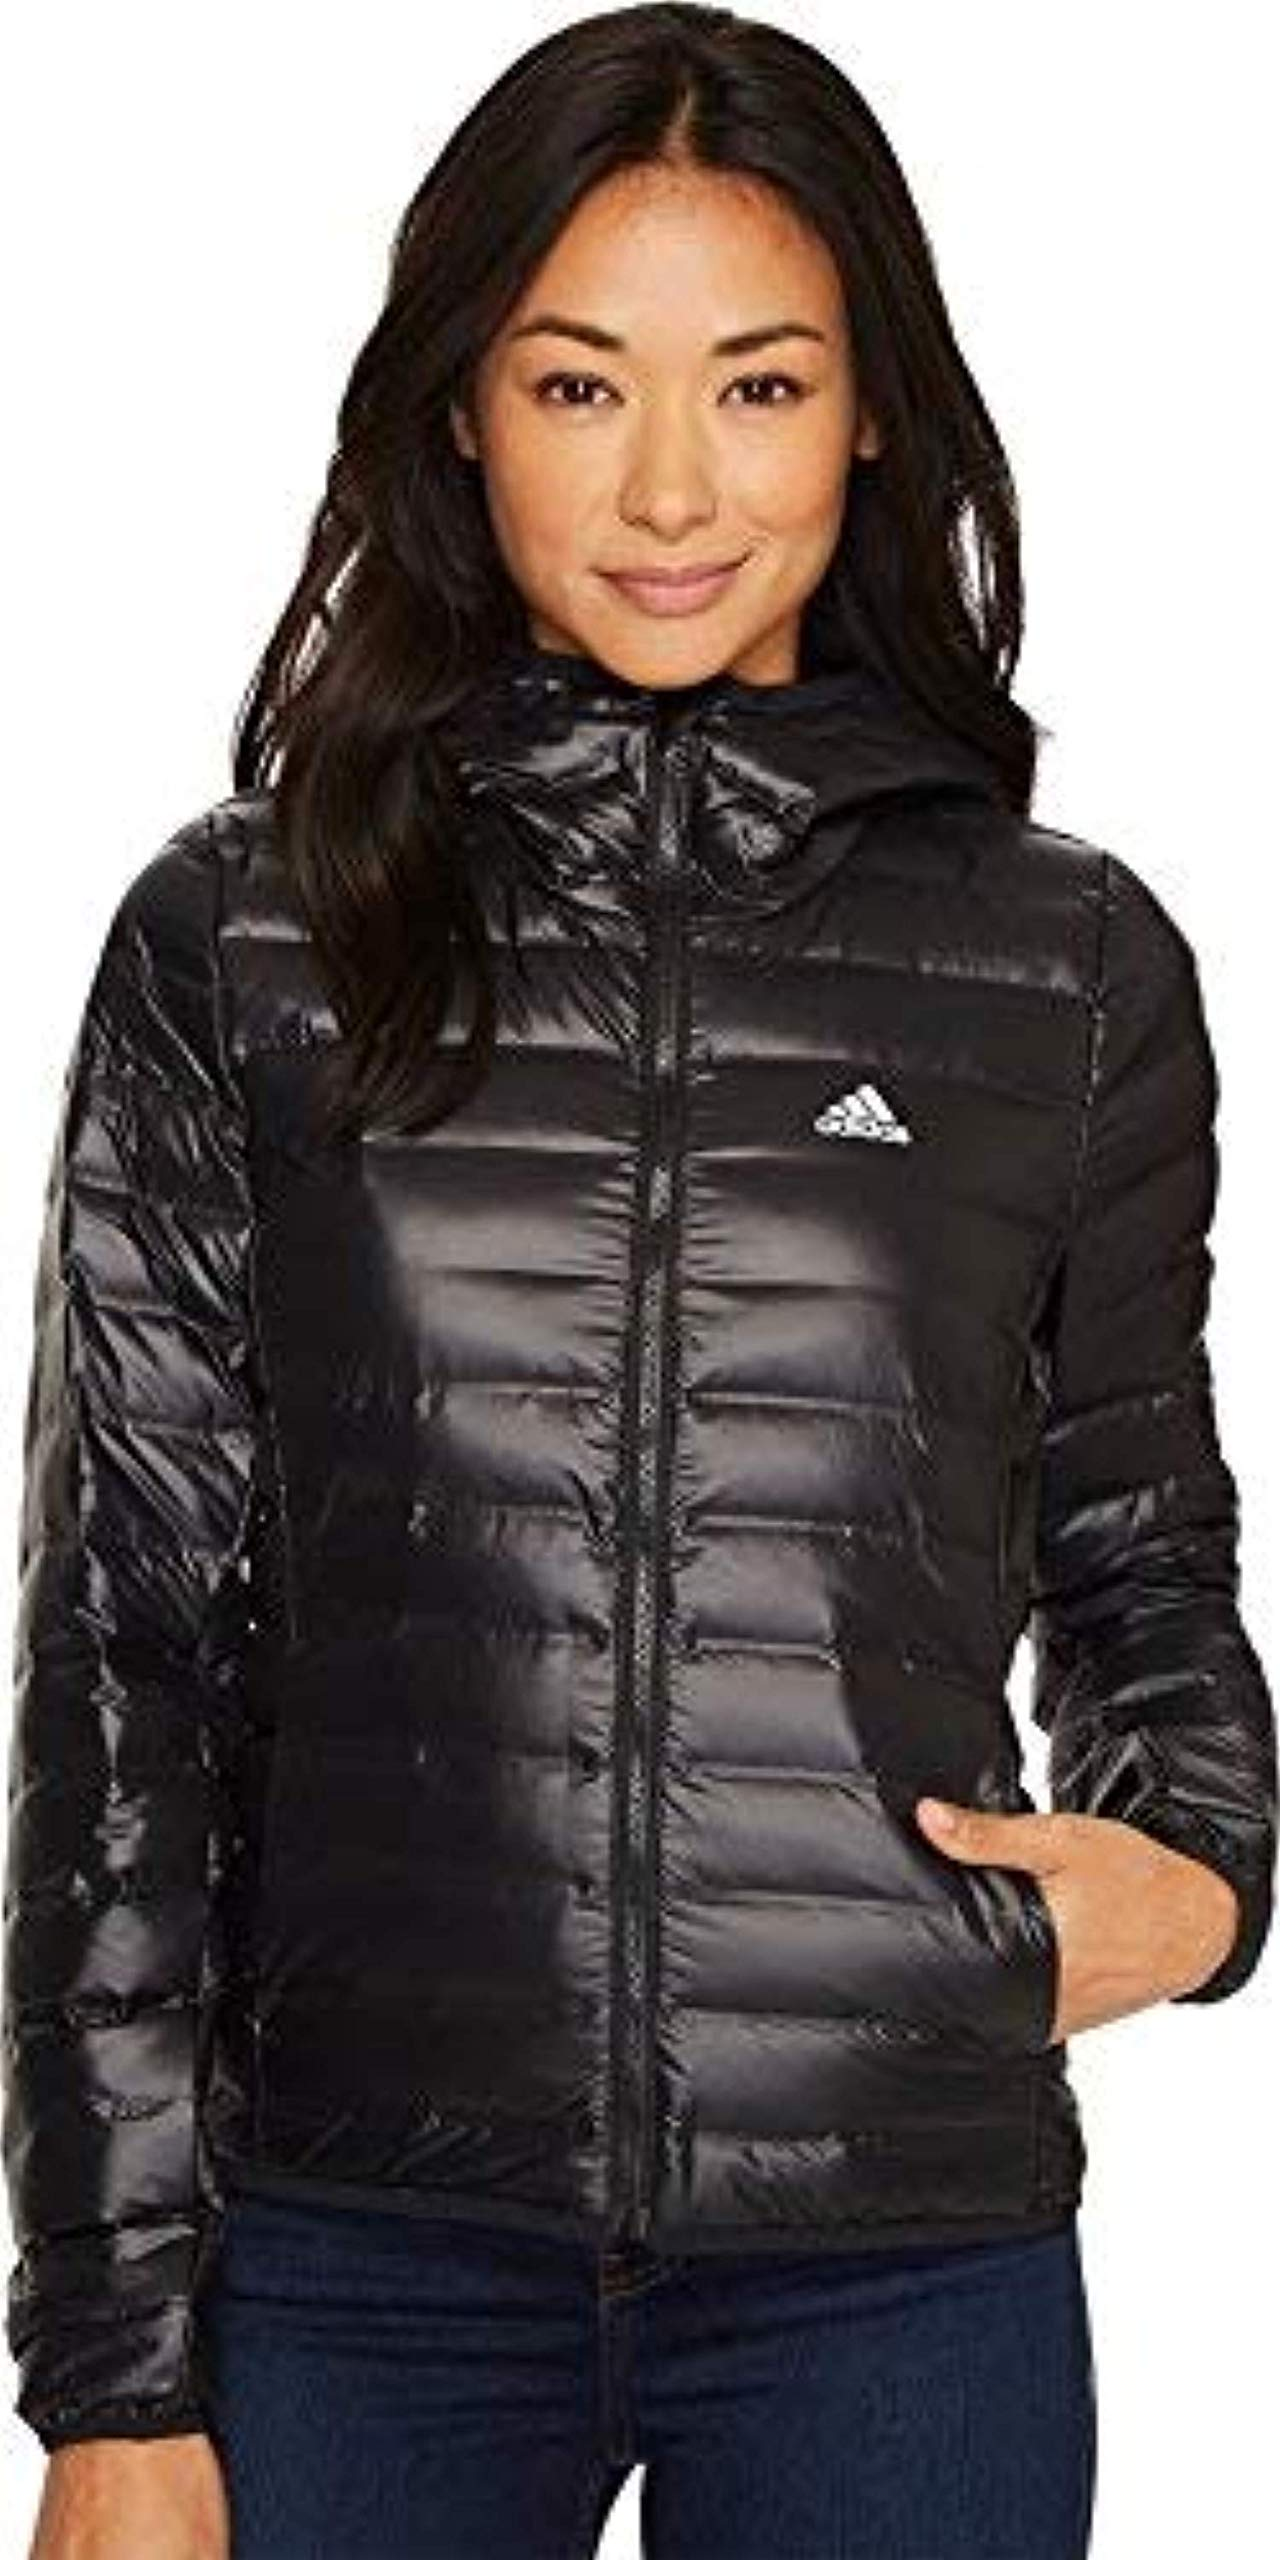 adidas outdoor Women's W Varilite Hooded Jacket, 2XL, Black